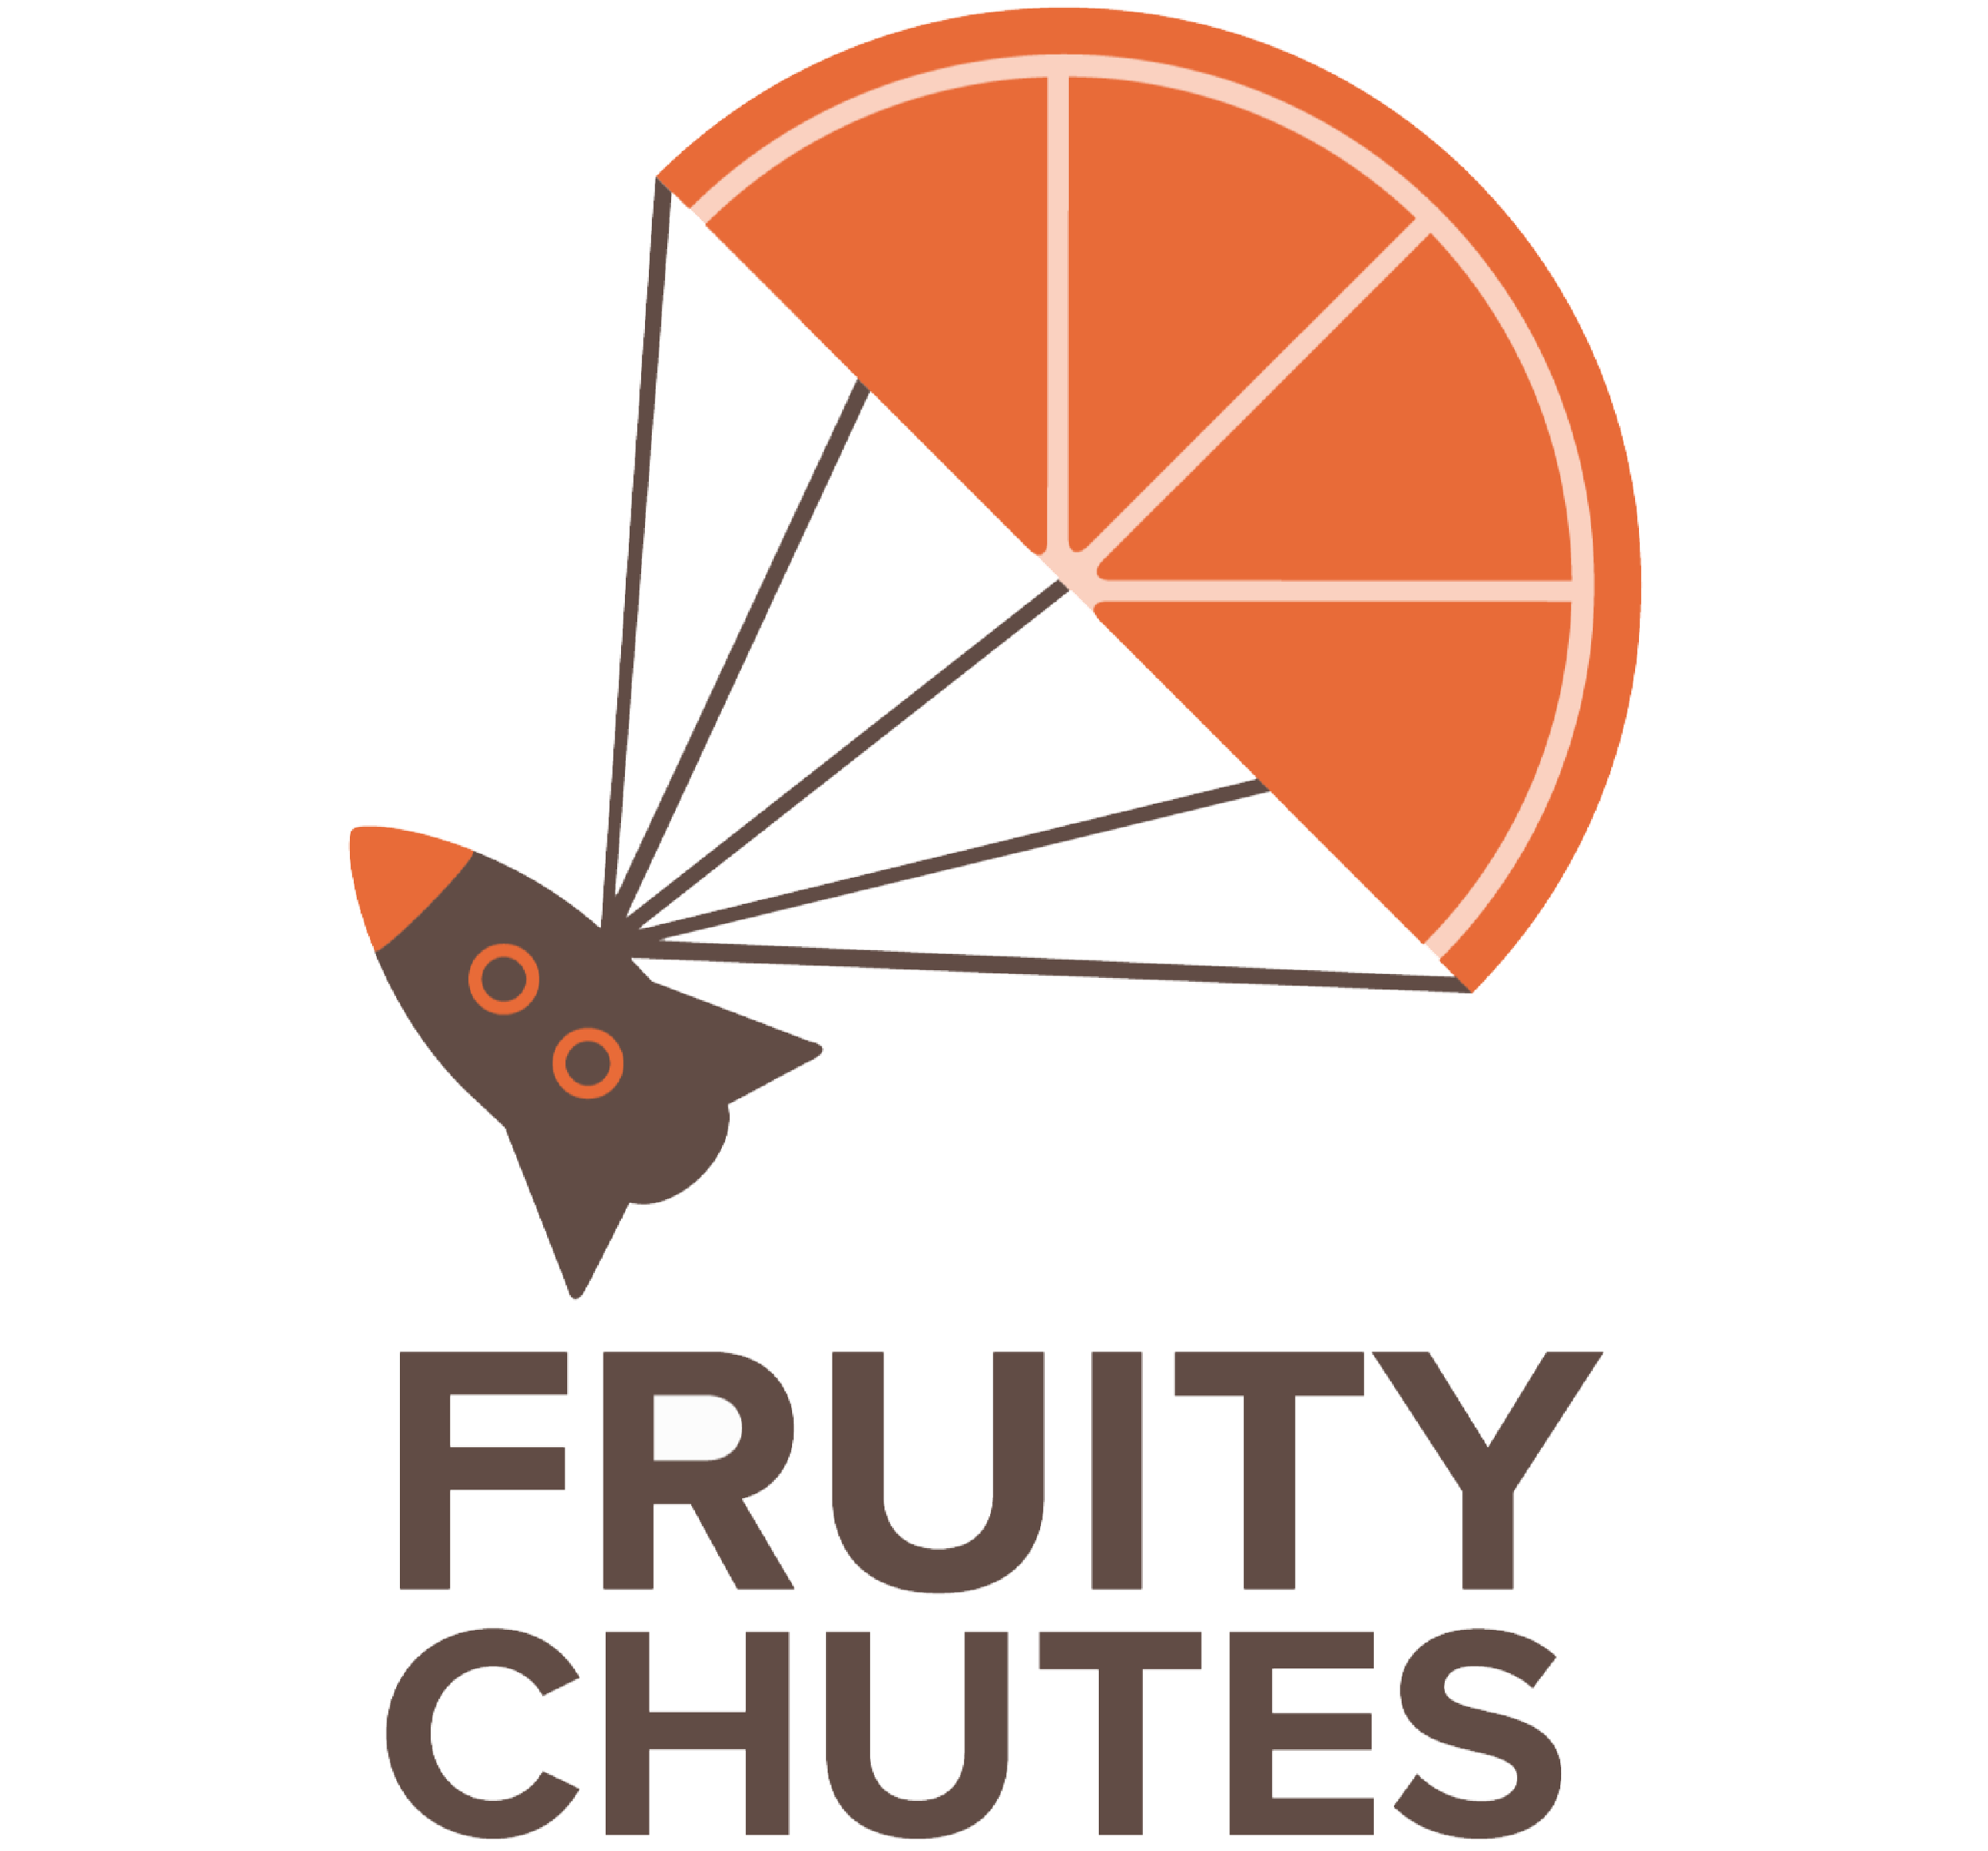 Fruity Chutes